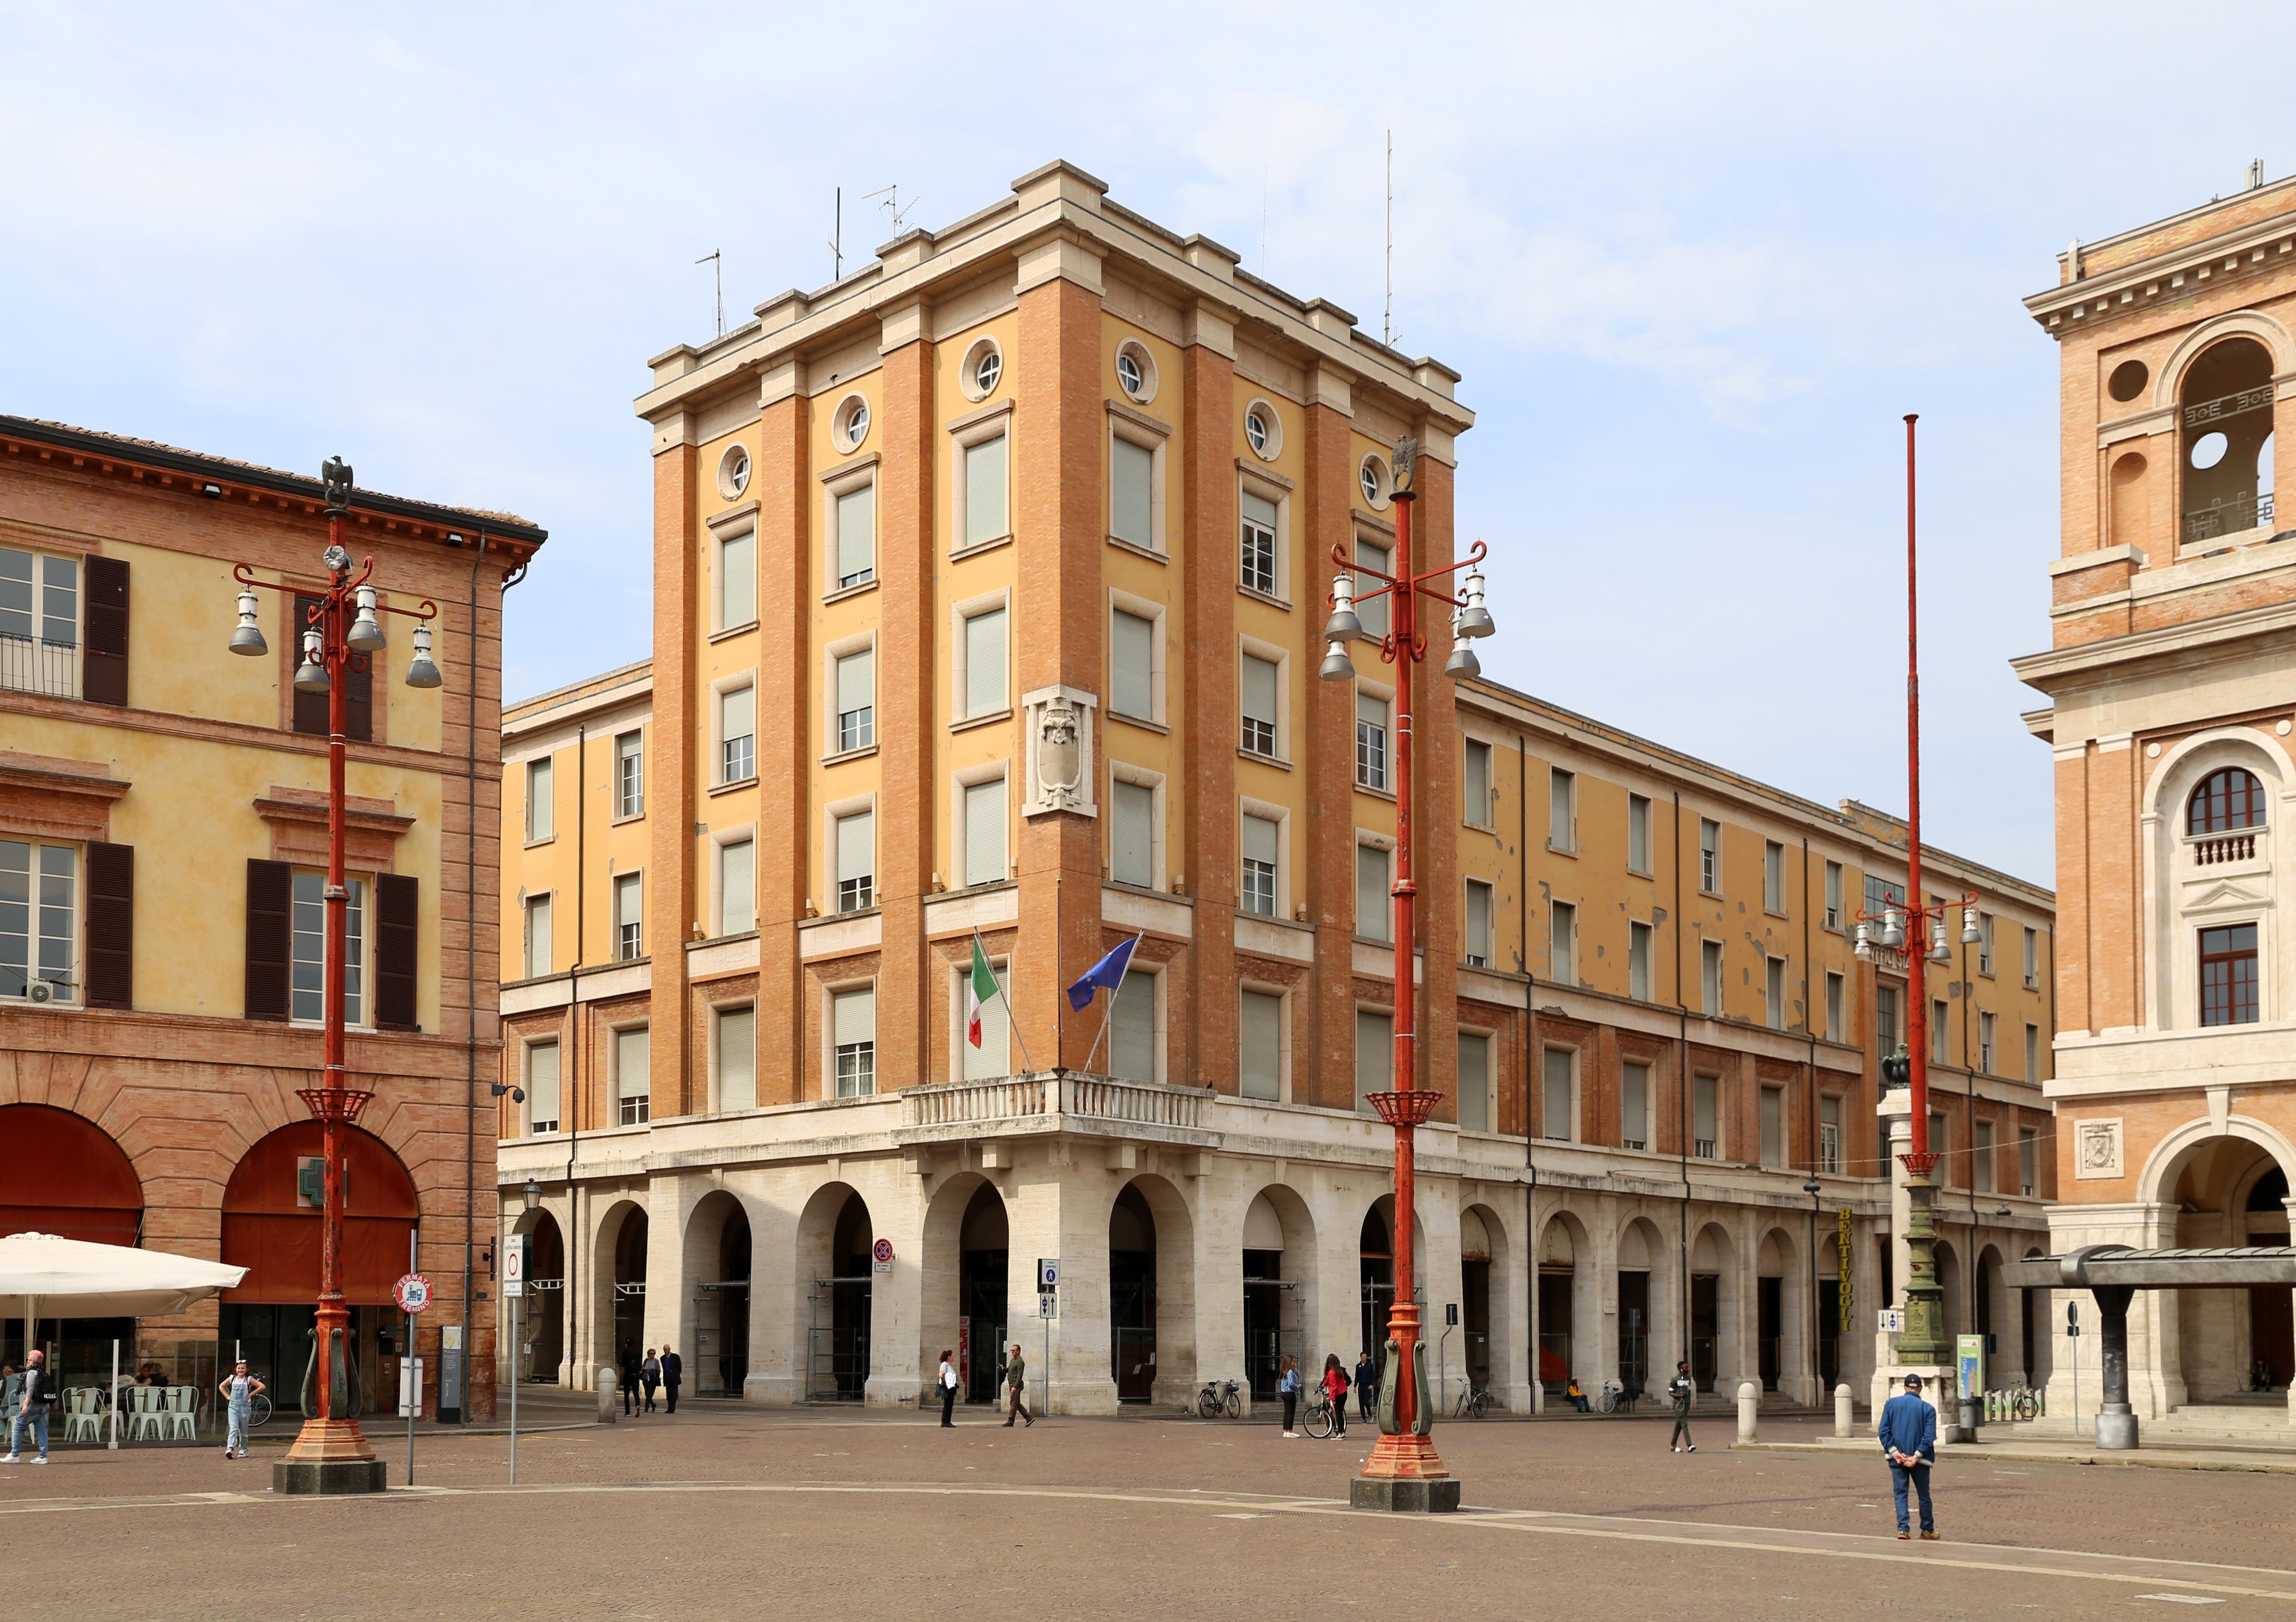 Piazza Della Misura Forli.Piazza Della Misura Forli